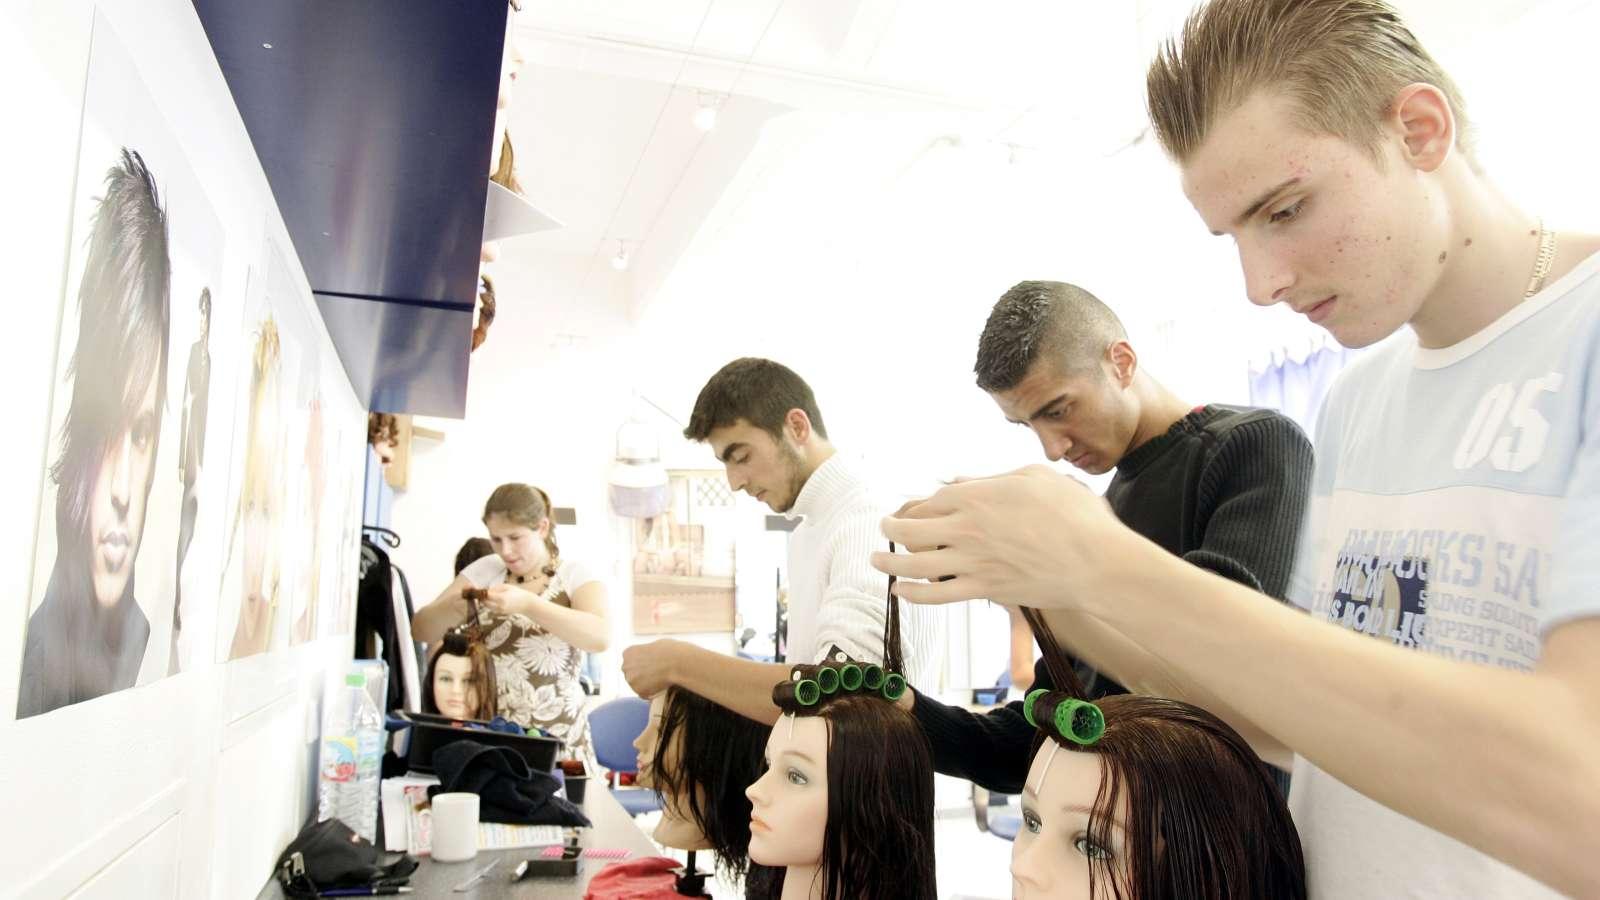 Ausbildung zur Friseurin, Berlin